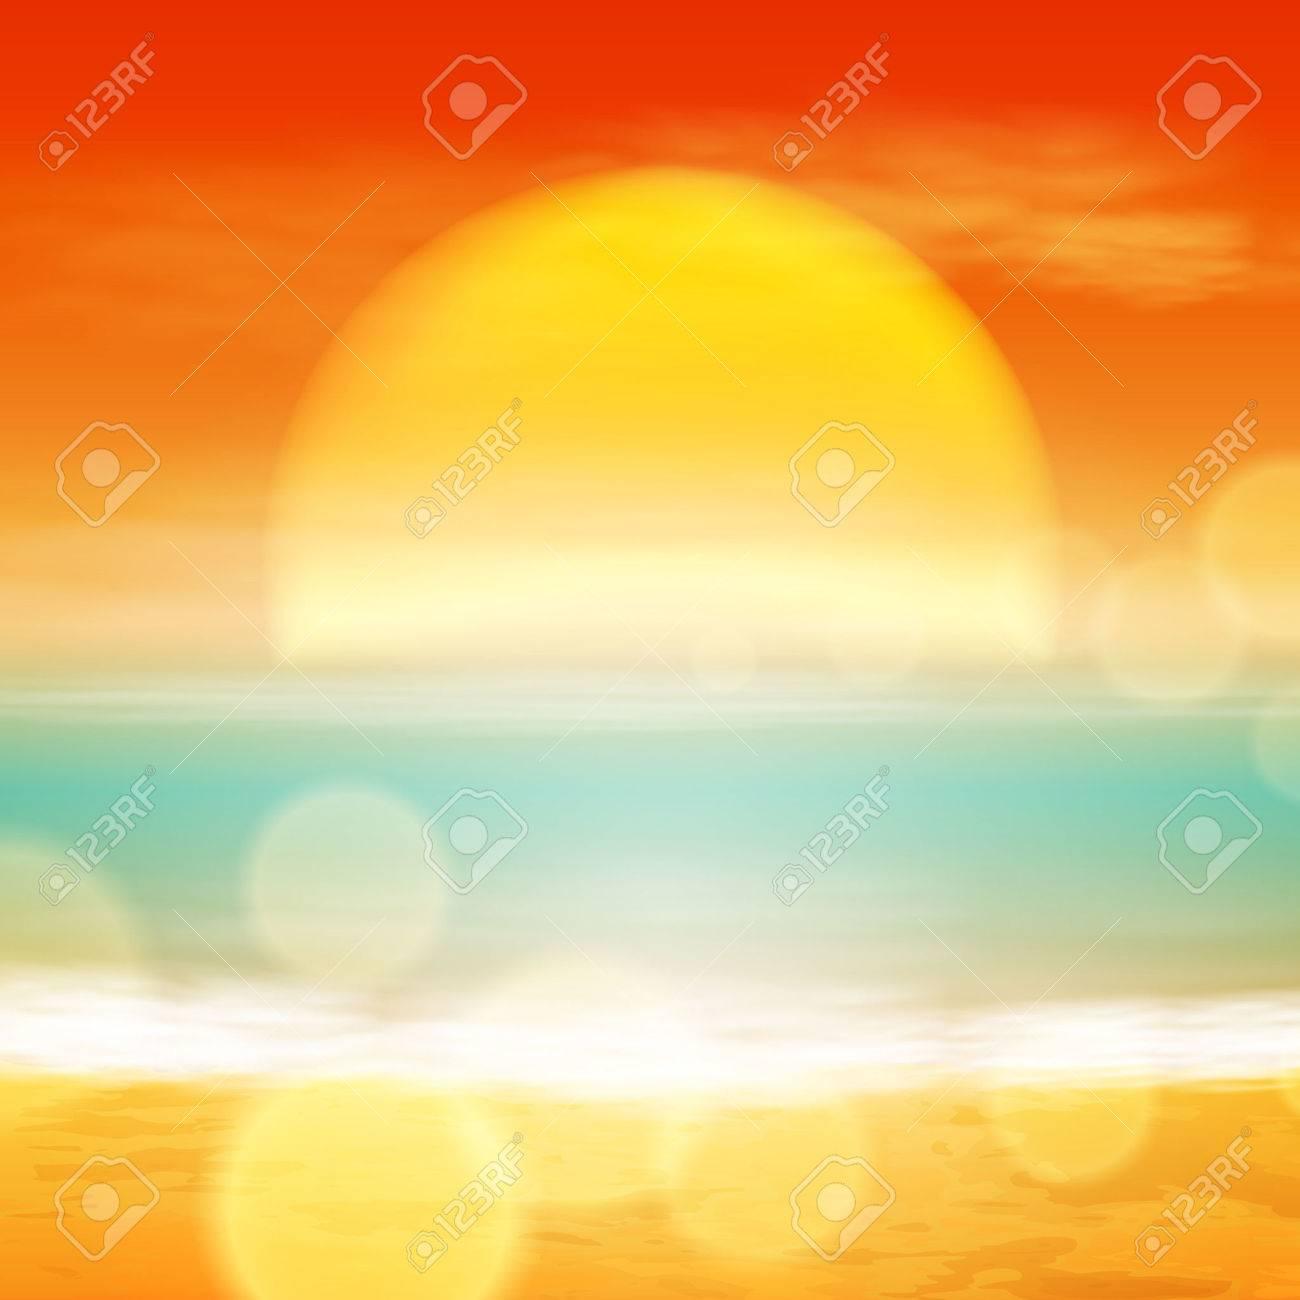 Sea sunset with the sun, light on lens. EPS10 vector. - 38847294